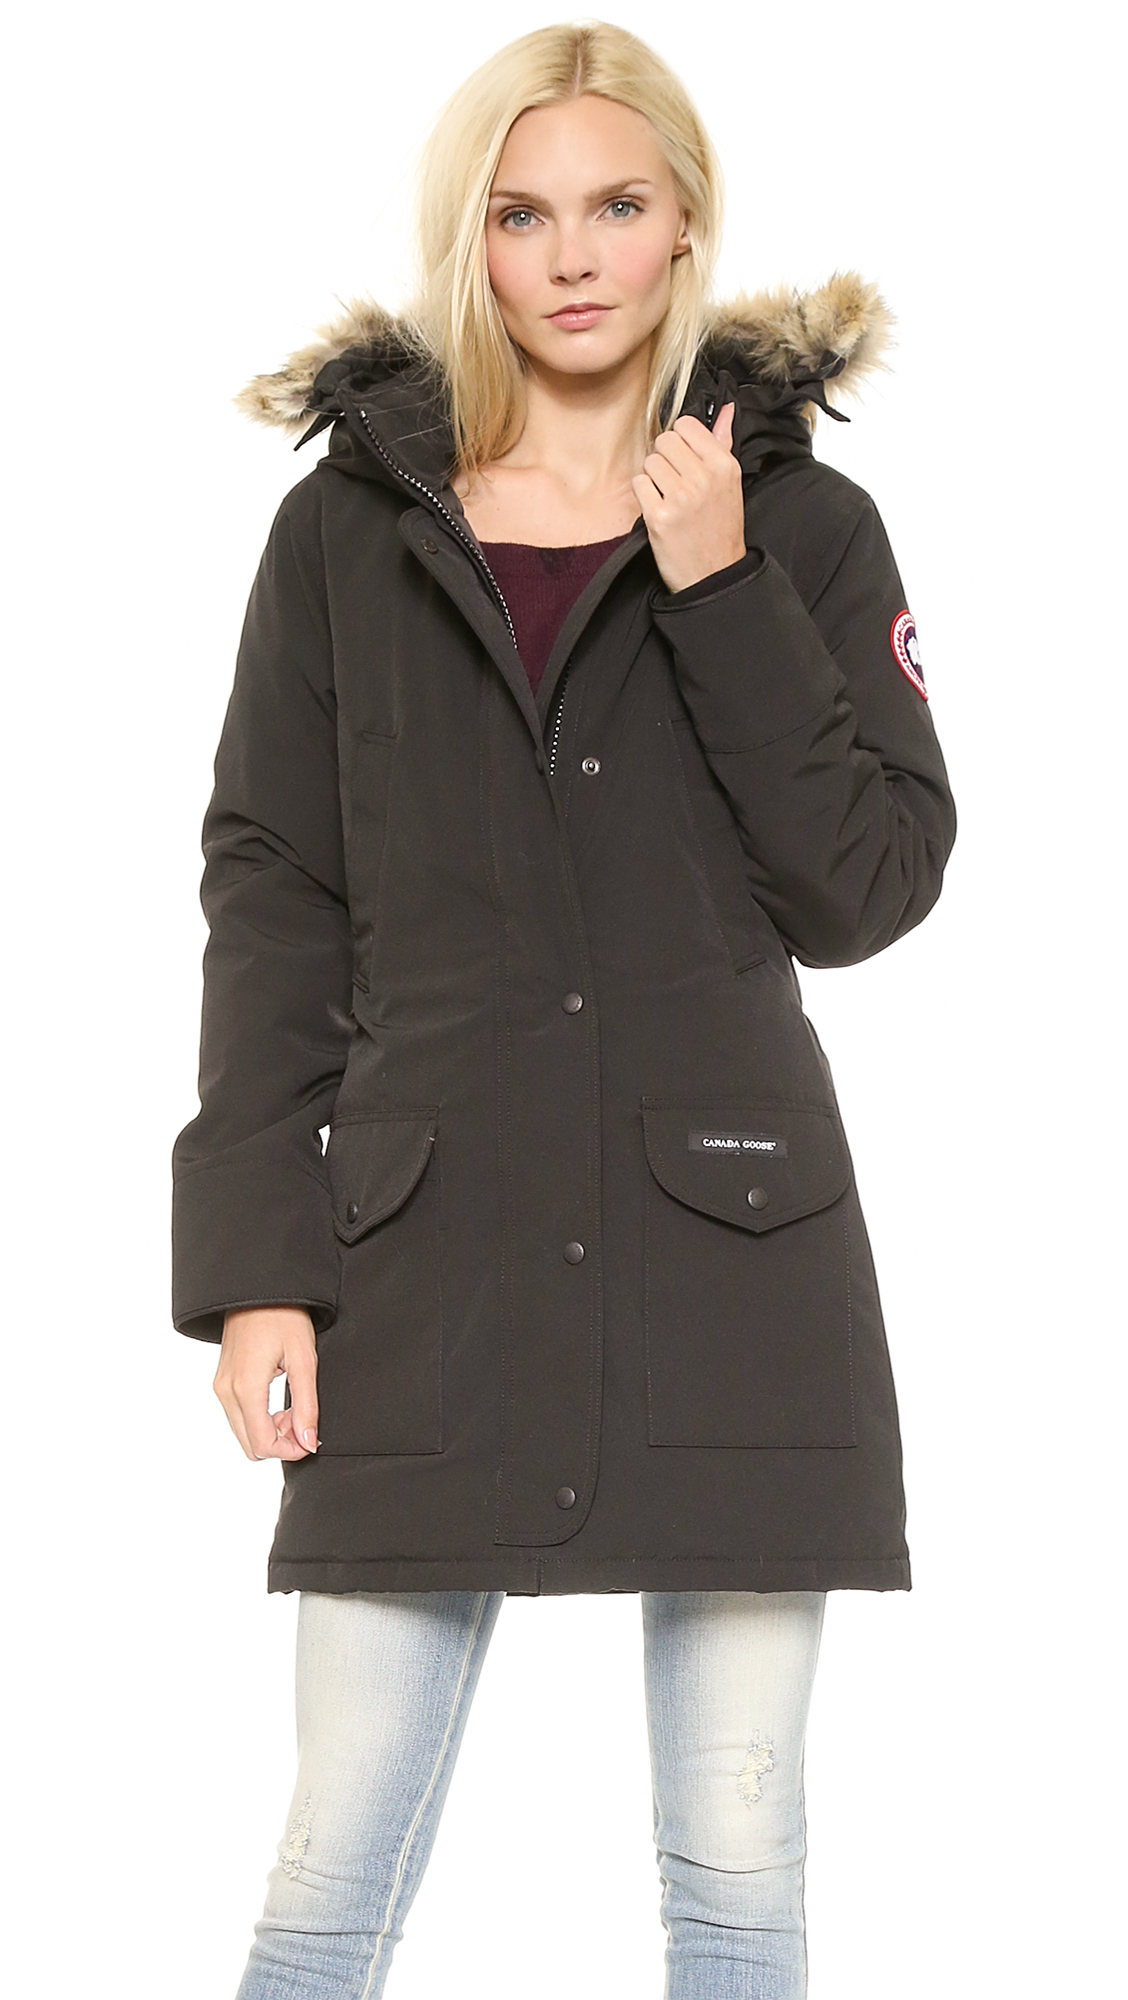 Canada Goose vest replica cheap - Canada goose Canada Goose - Military Green in Black | Lyst